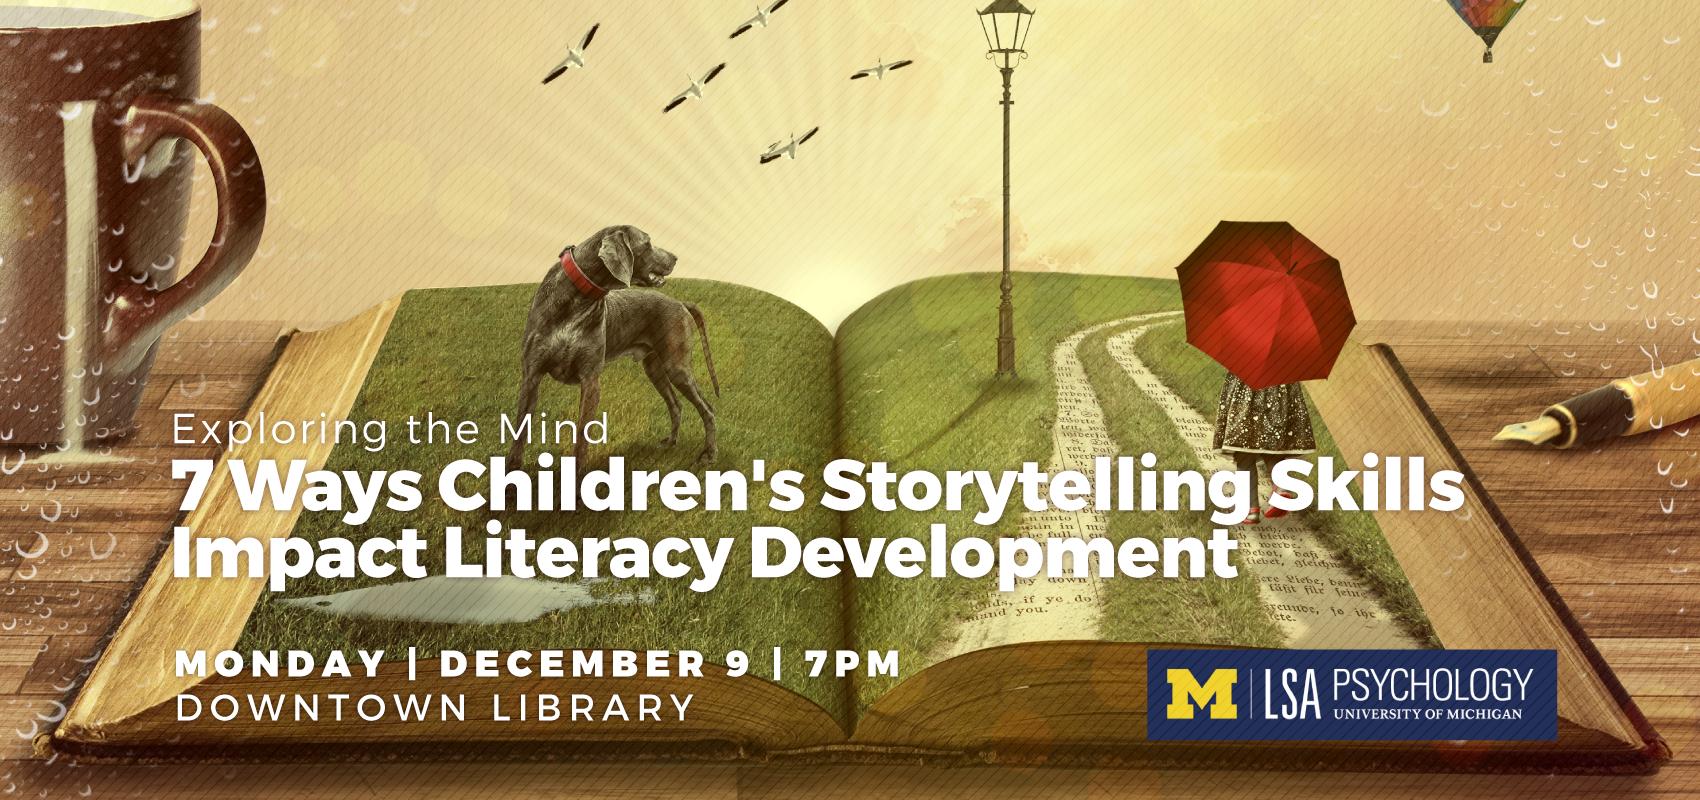 Exploring the Mind   7 Ways Children's Storytelling Skills Impact Literacy Development. .